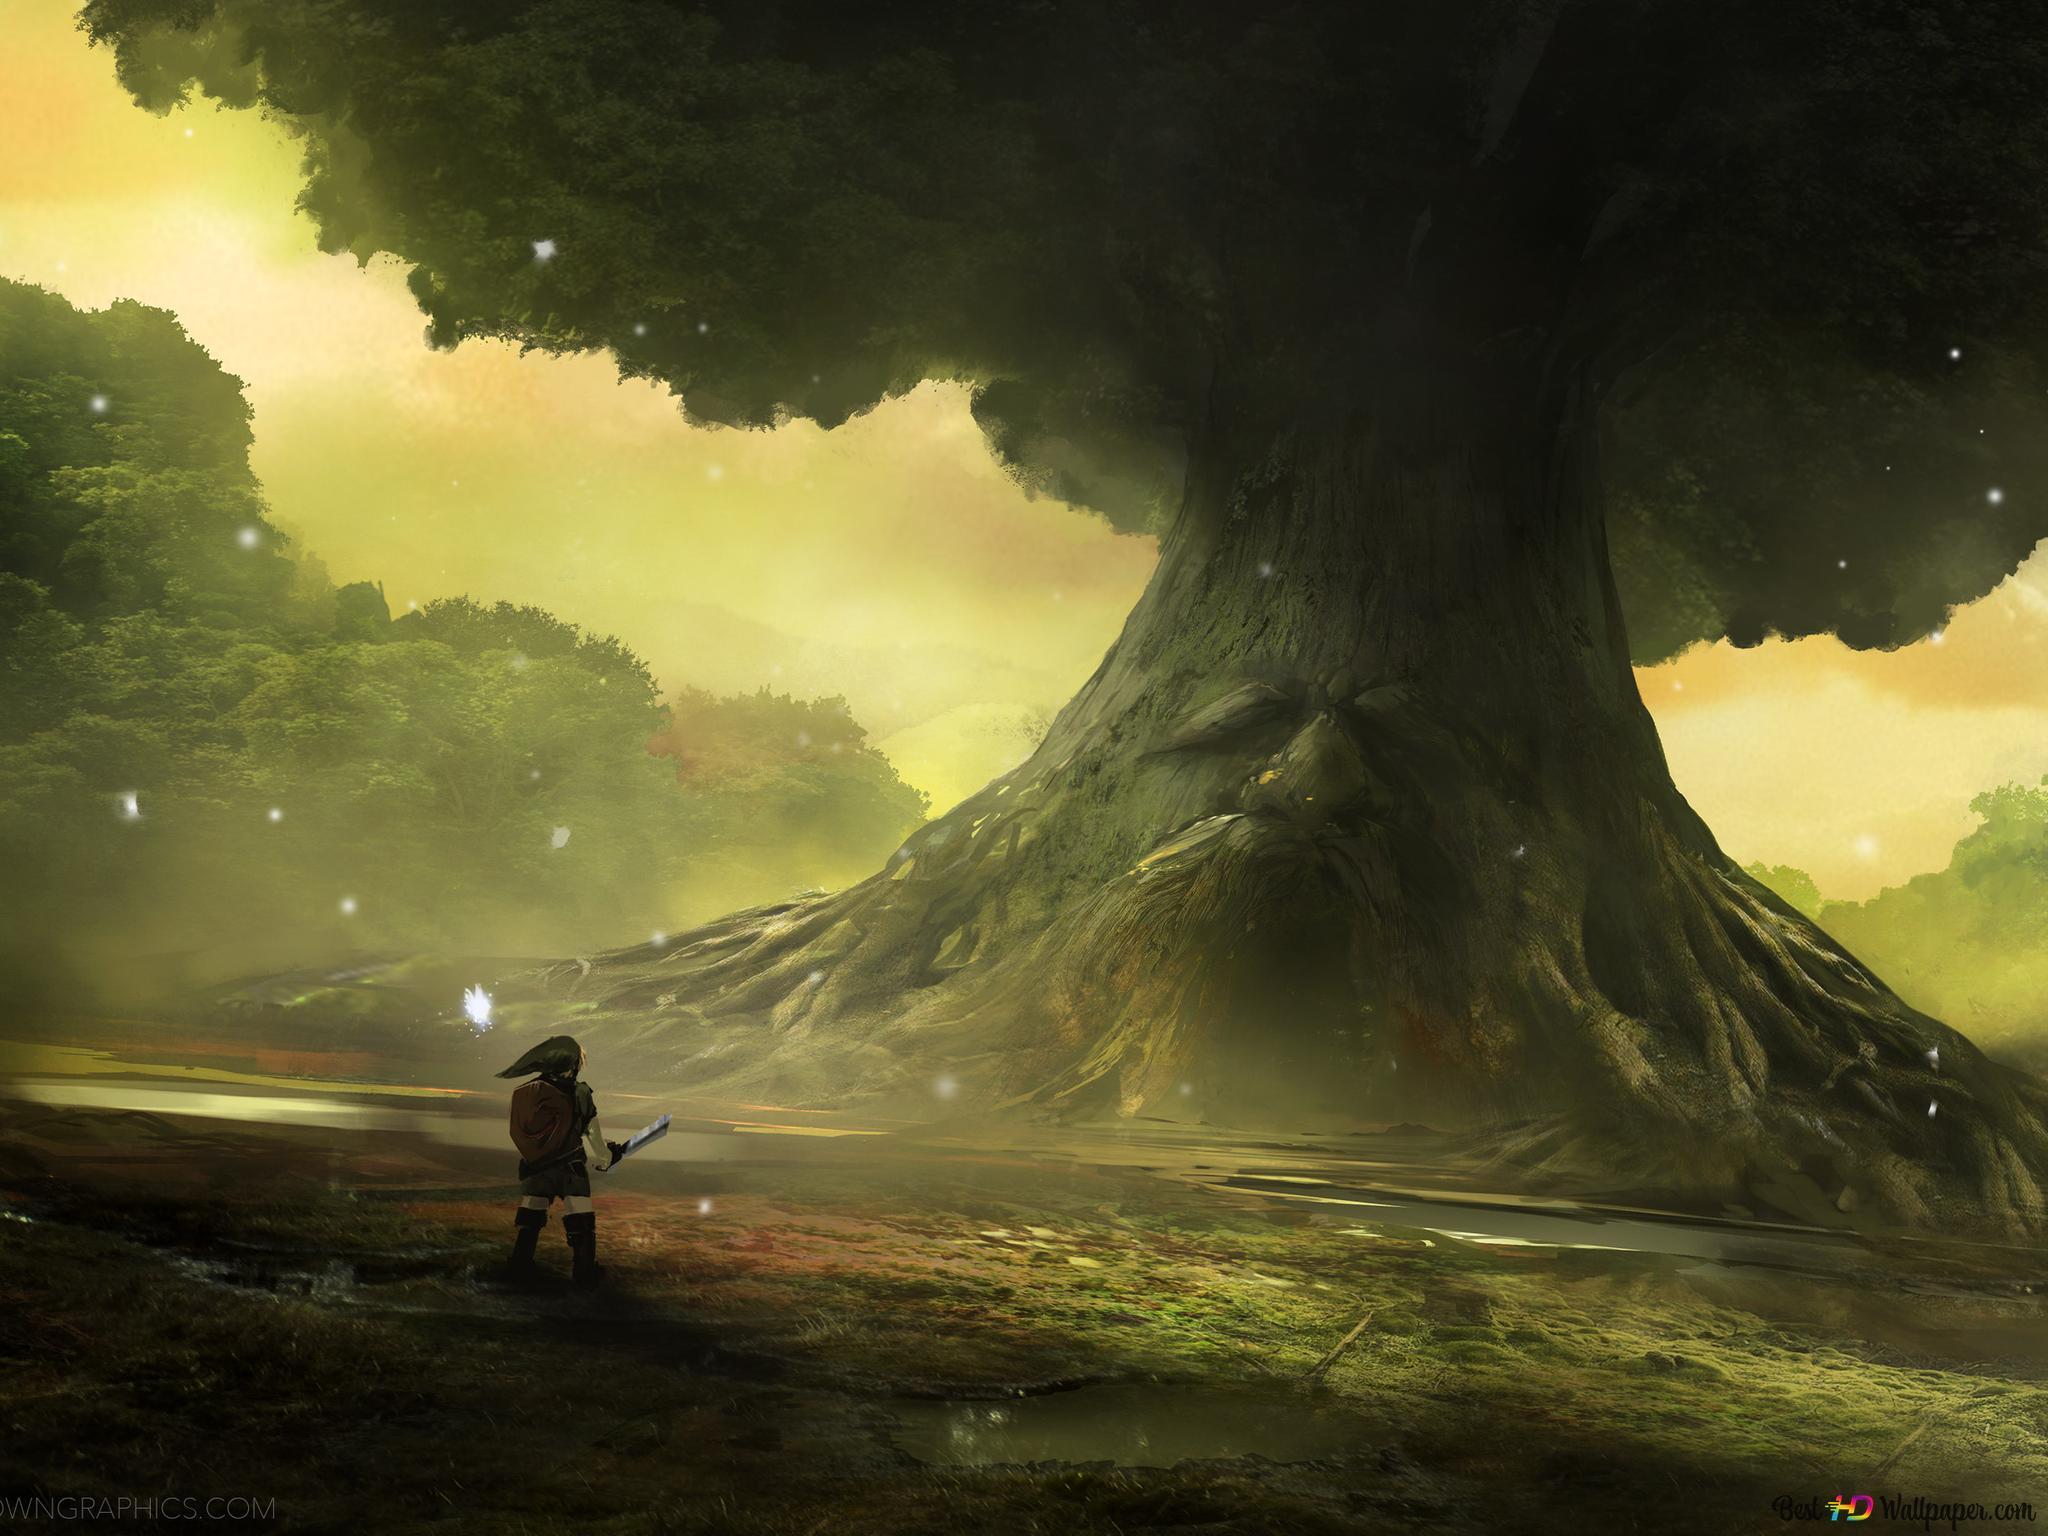 The Legend Of Zelda Ocarina Of Time Hd Wallpaper Download